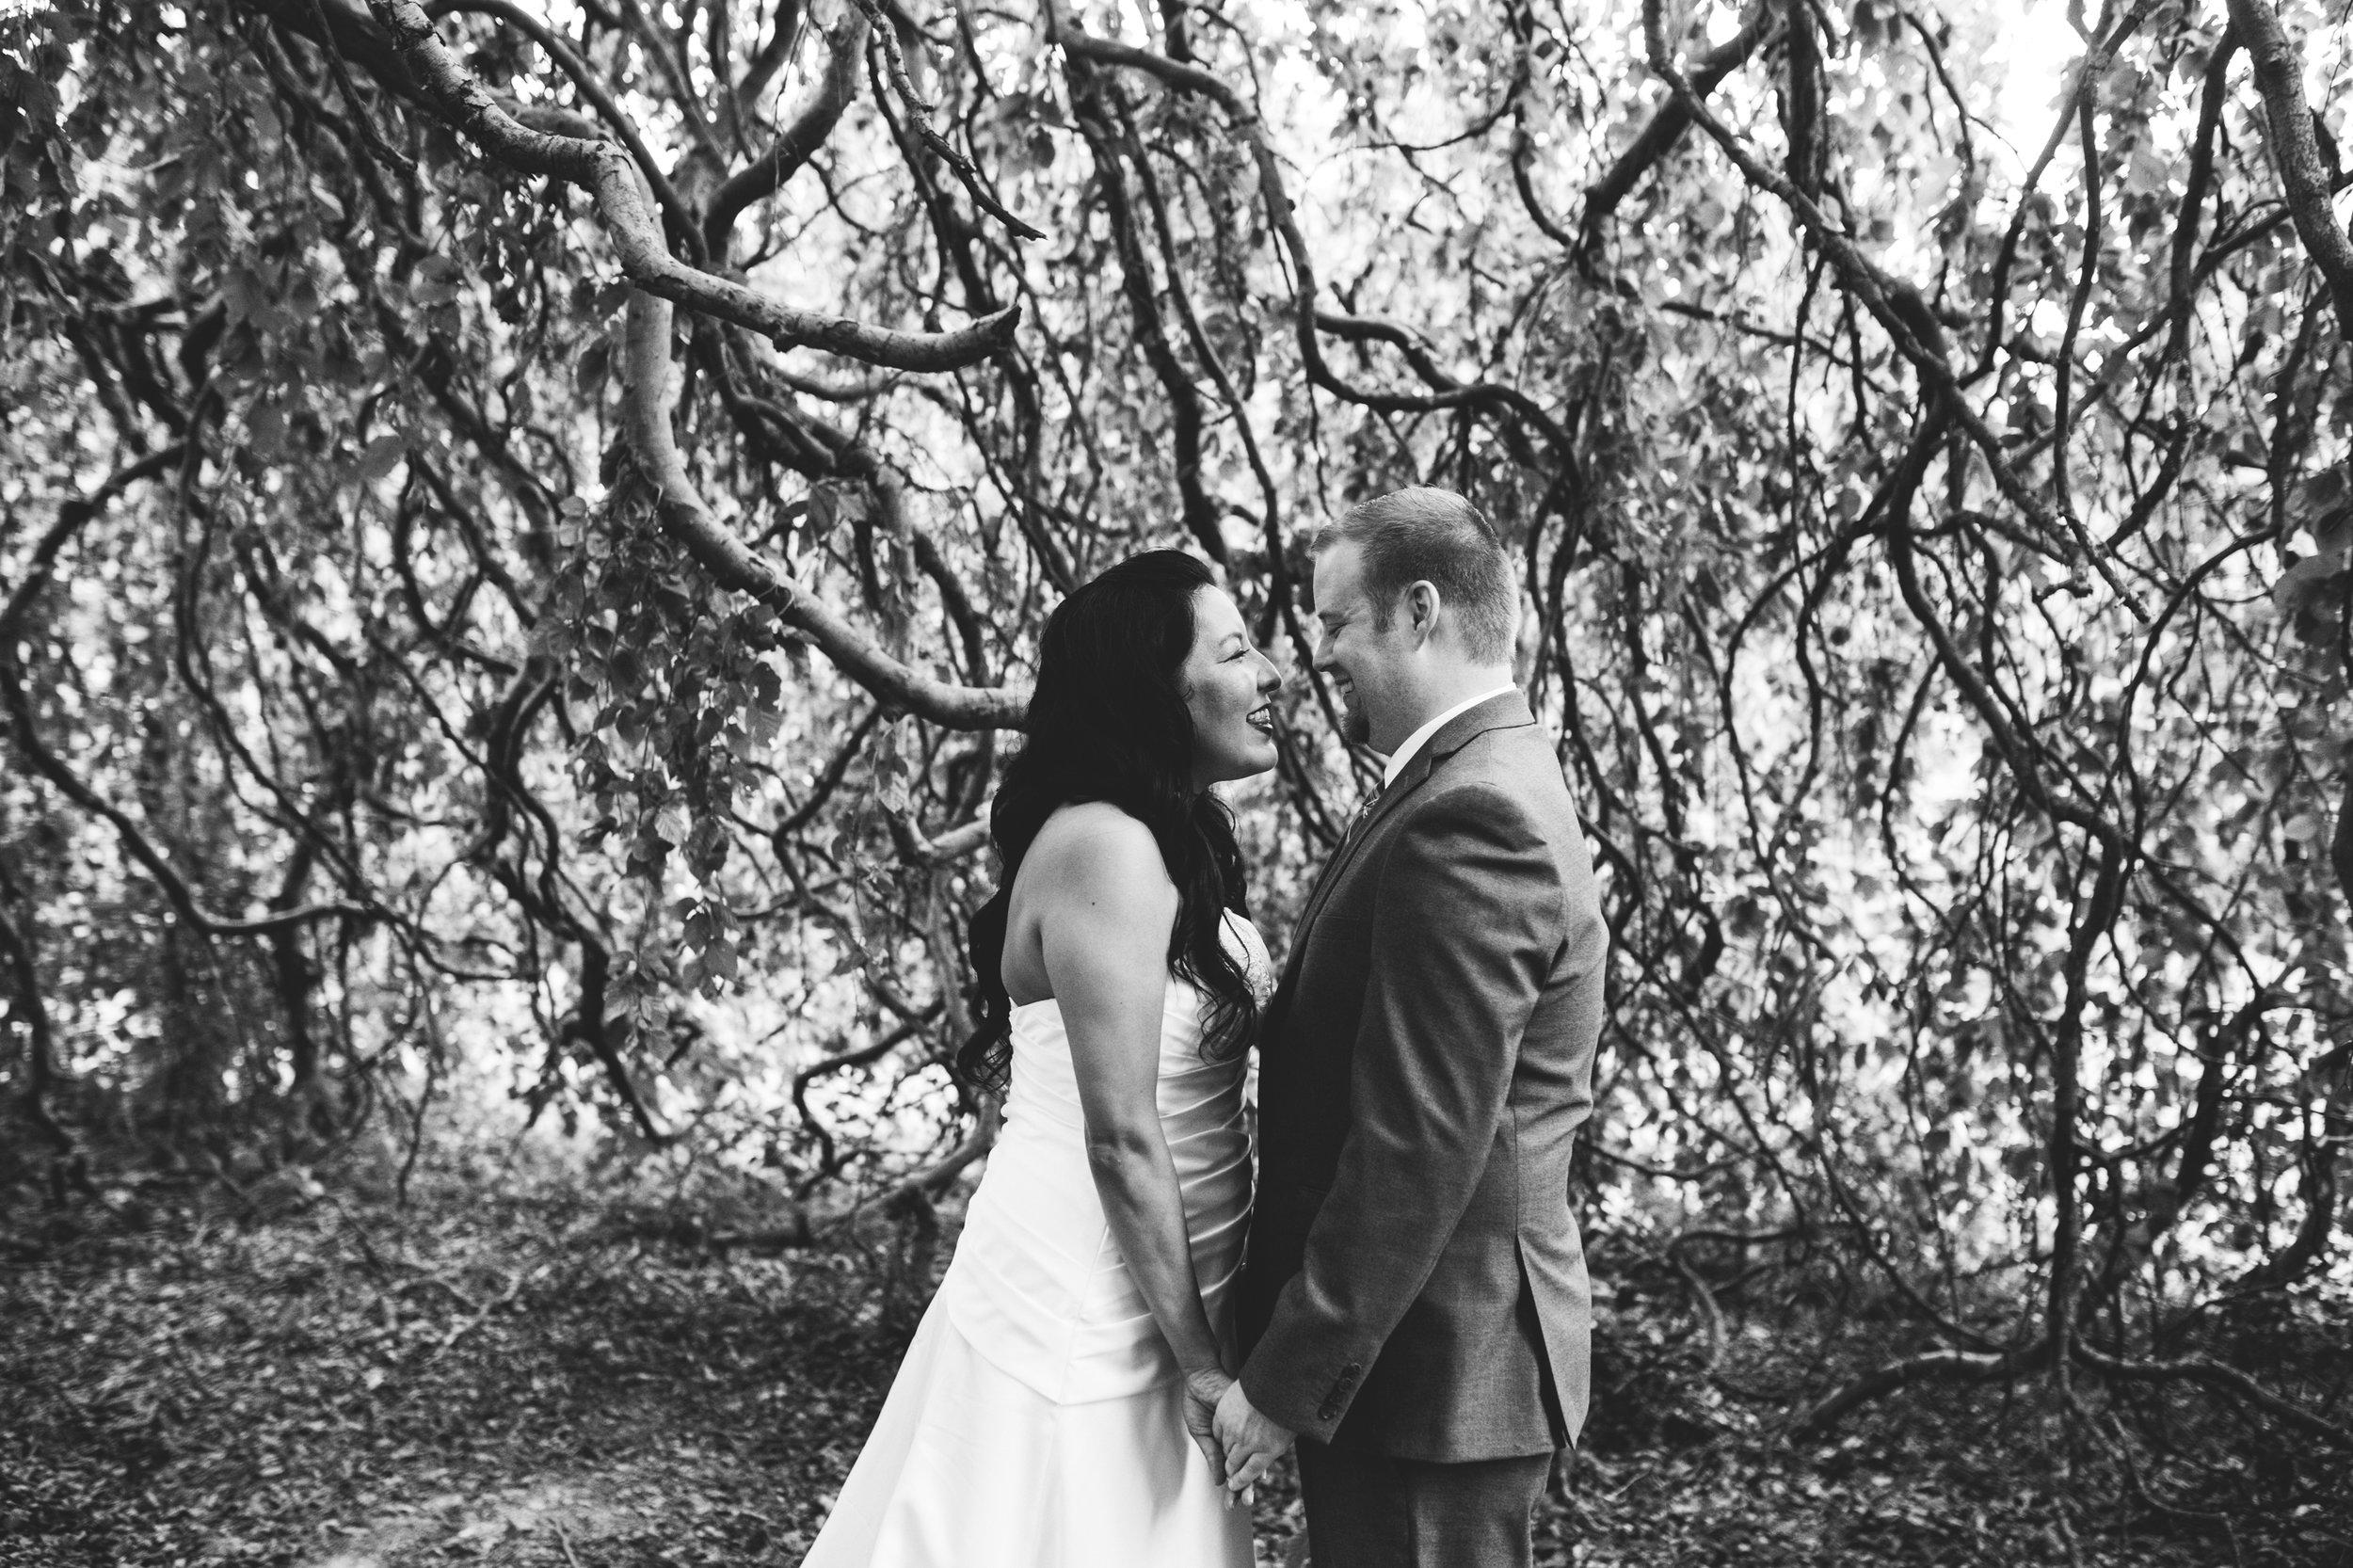 Kentucky Wedding Louisville Wedding Photographer 2018 Crystal Ludwick Photo Louisville Wedding Photographer Kentucky Wedding Photographer (23 of 76).jpg